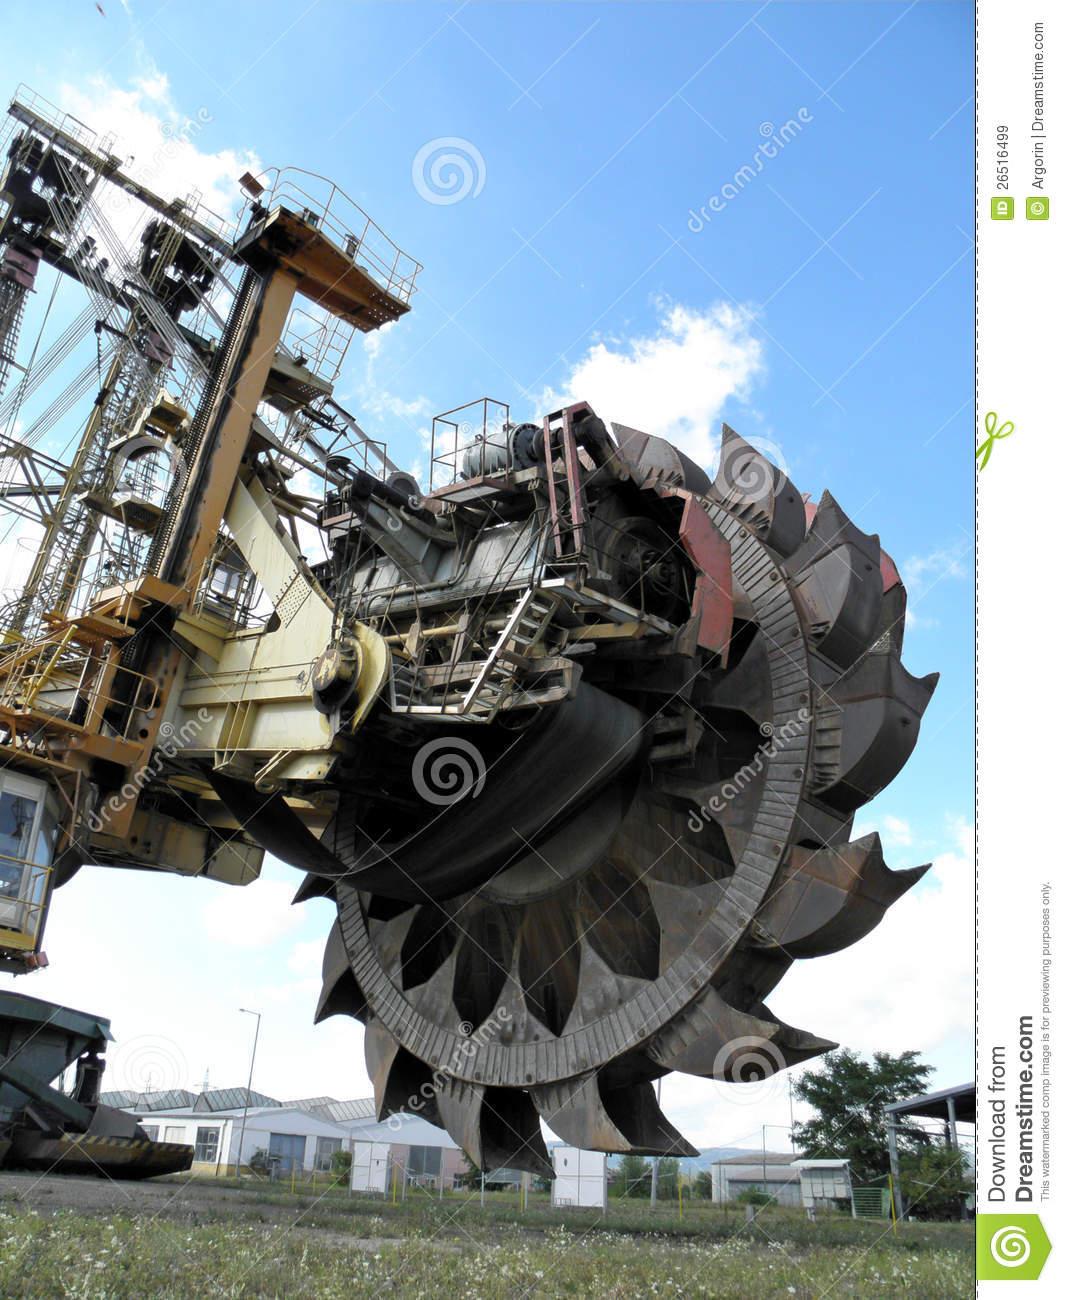 Bucket Wheel Excavator Royalty Free Stock Images.